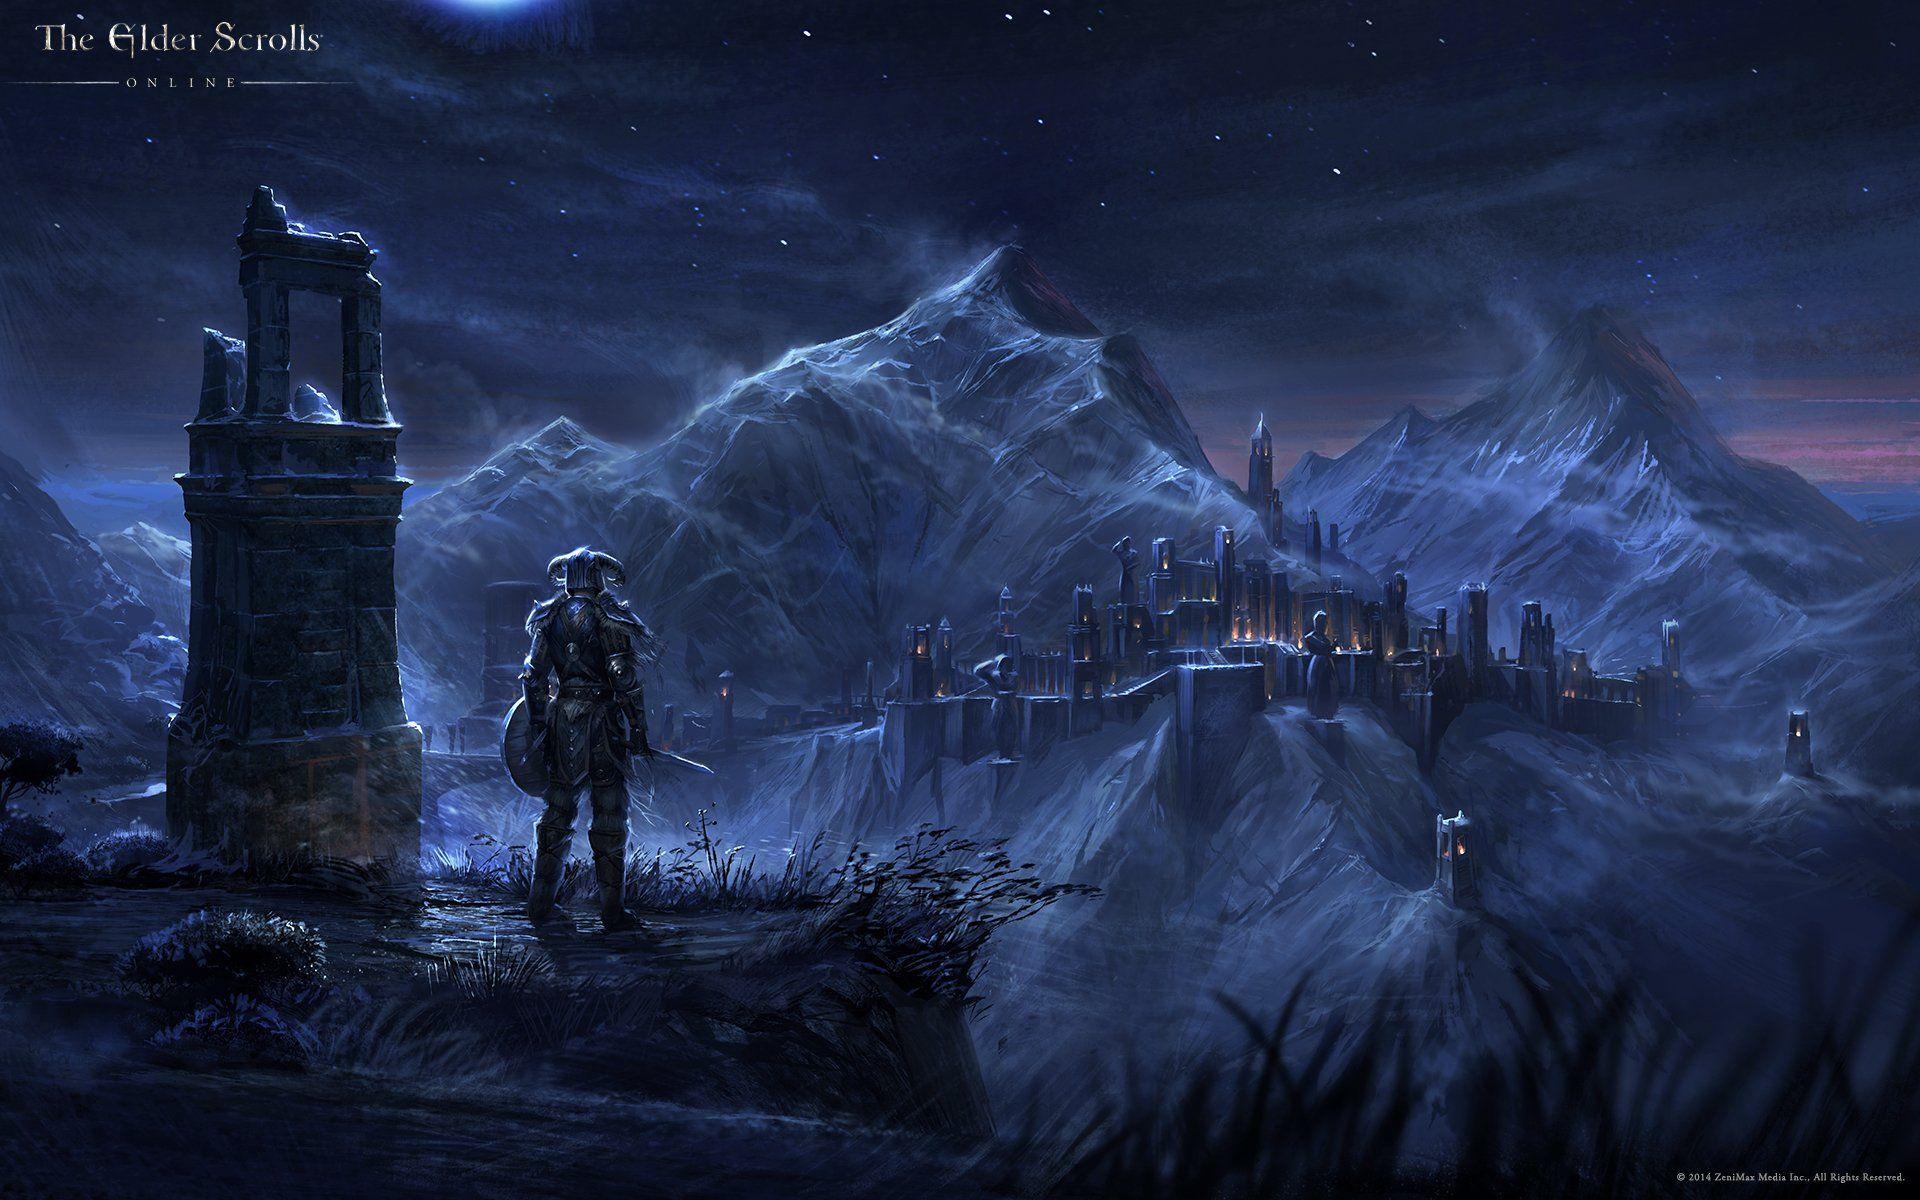 Video Game The Elder Scrolls Online Wallpaper Elder Scrolls Online Concept Art World Elder Scrolls